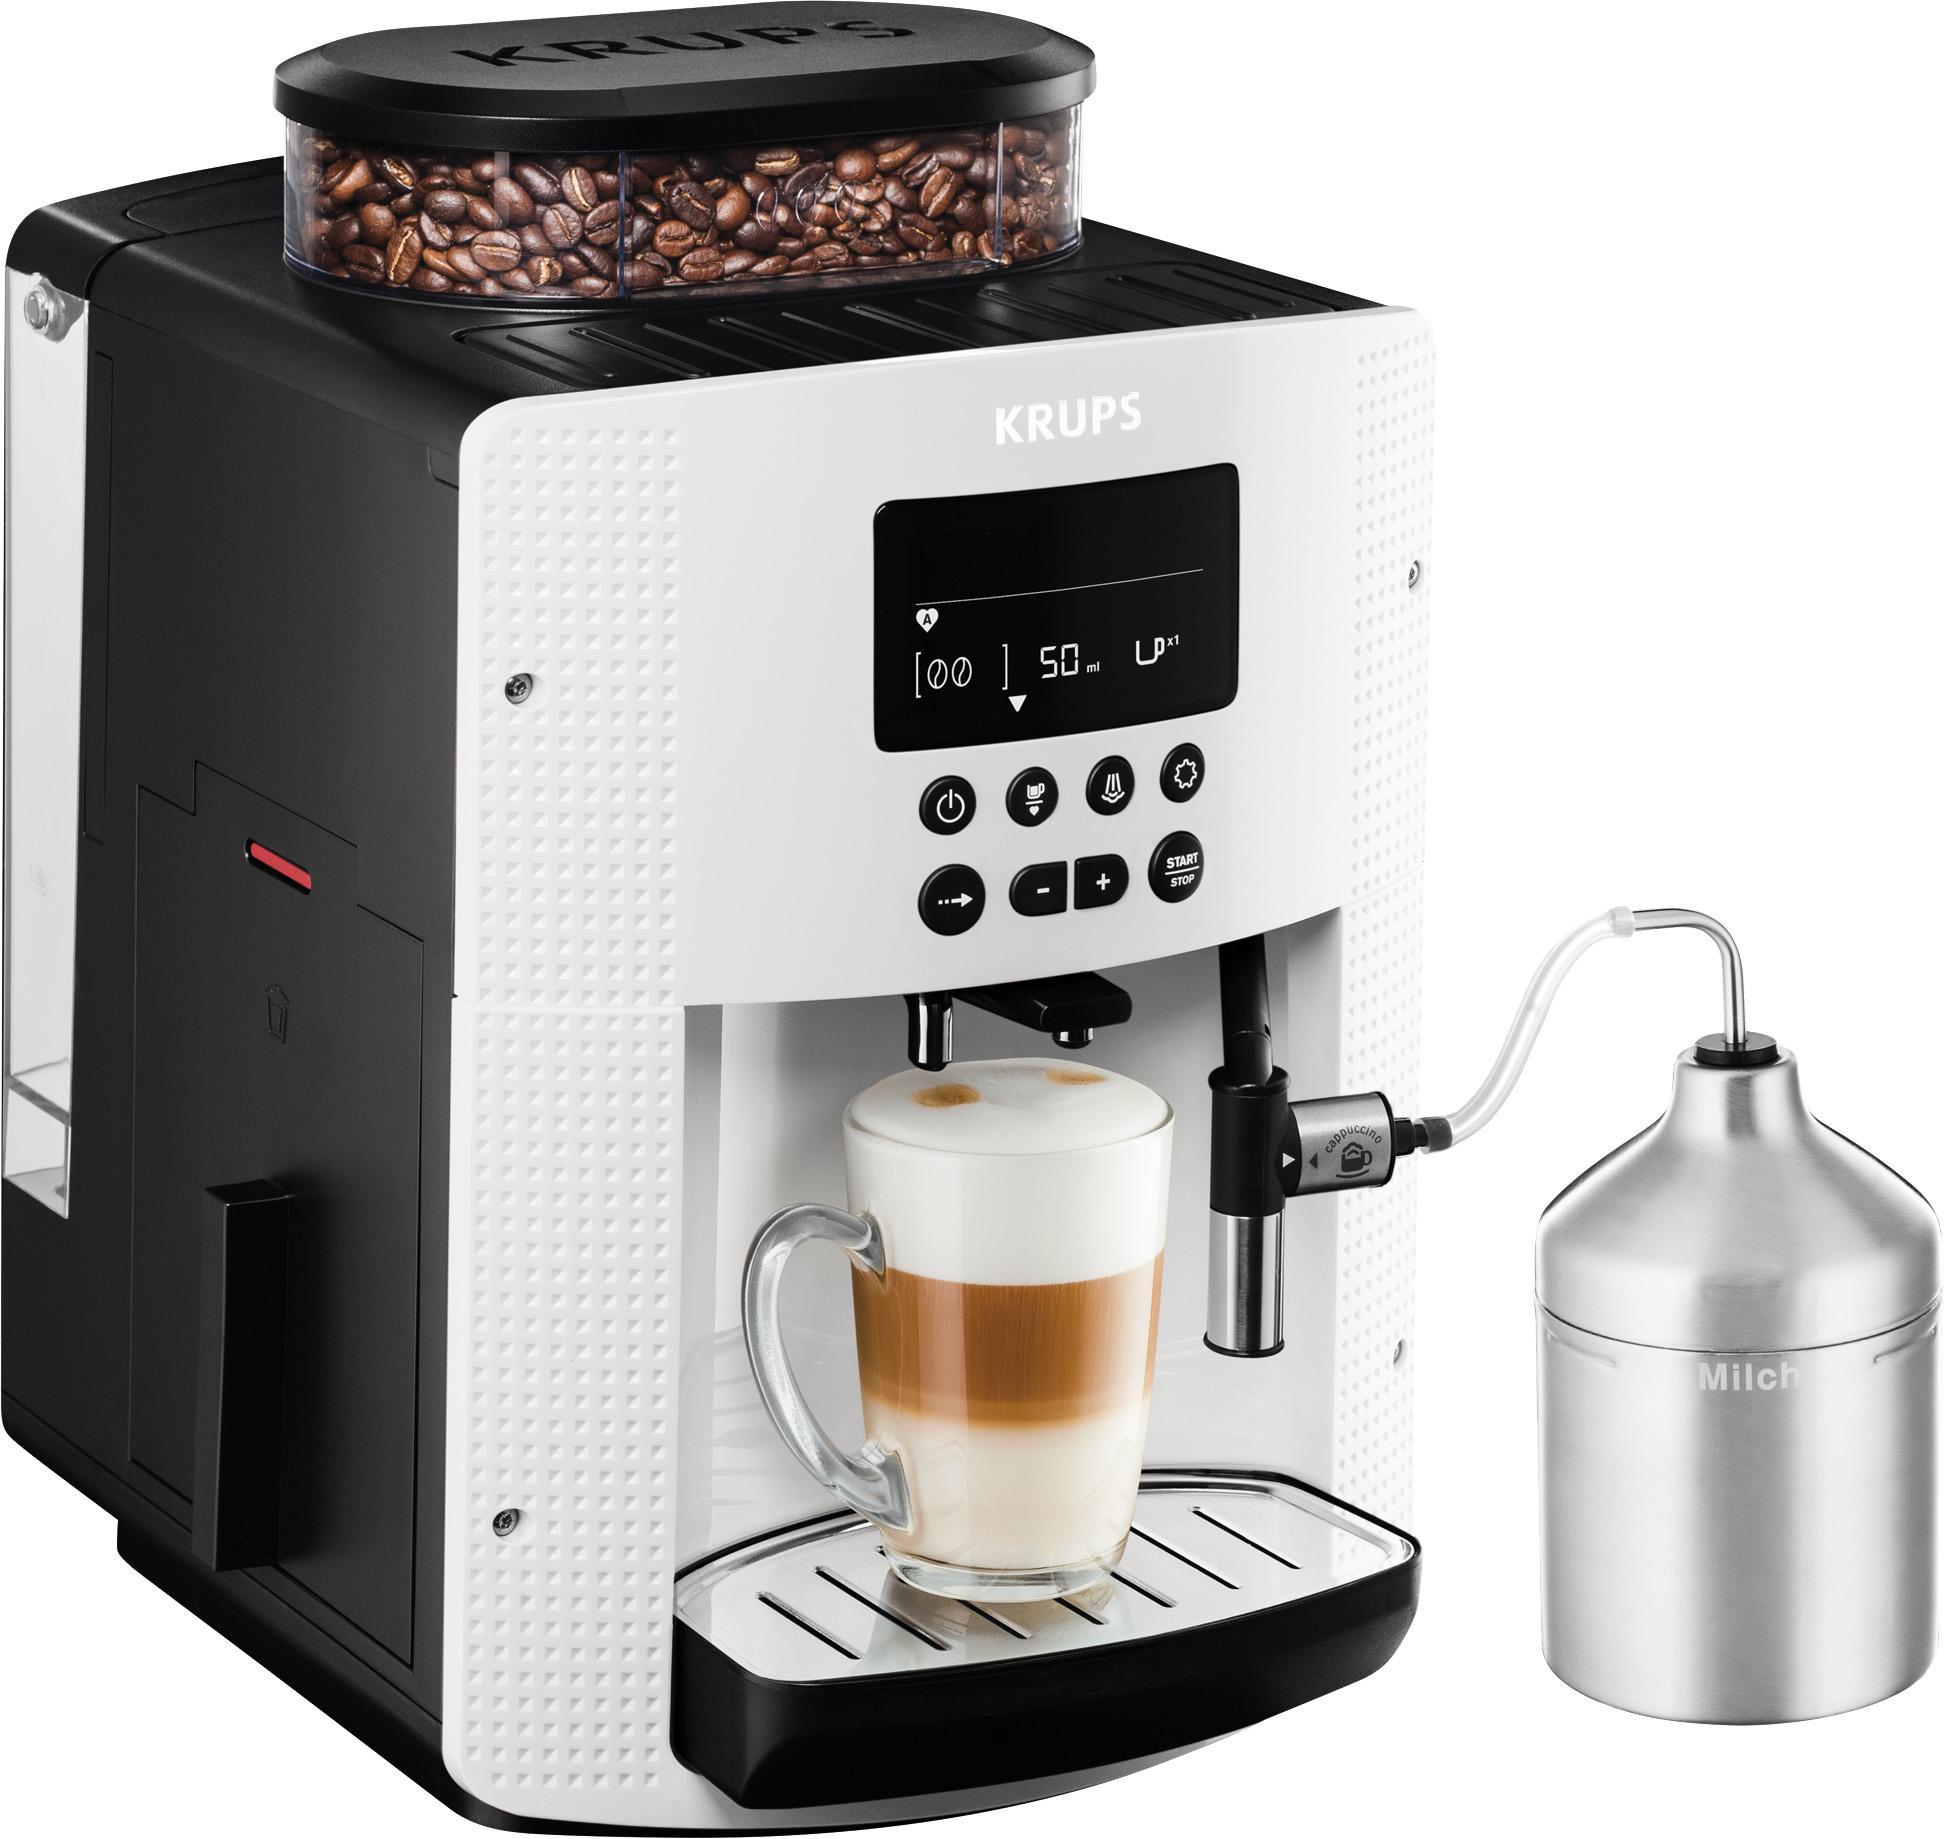 Krups Kaffeevollautomat EA8161, 1, 8l Tank, Kegelmahlwerk   Küche und Esszimmer > Kaffee und Tee > Kaffeevollautomaten   Weiß   Krups